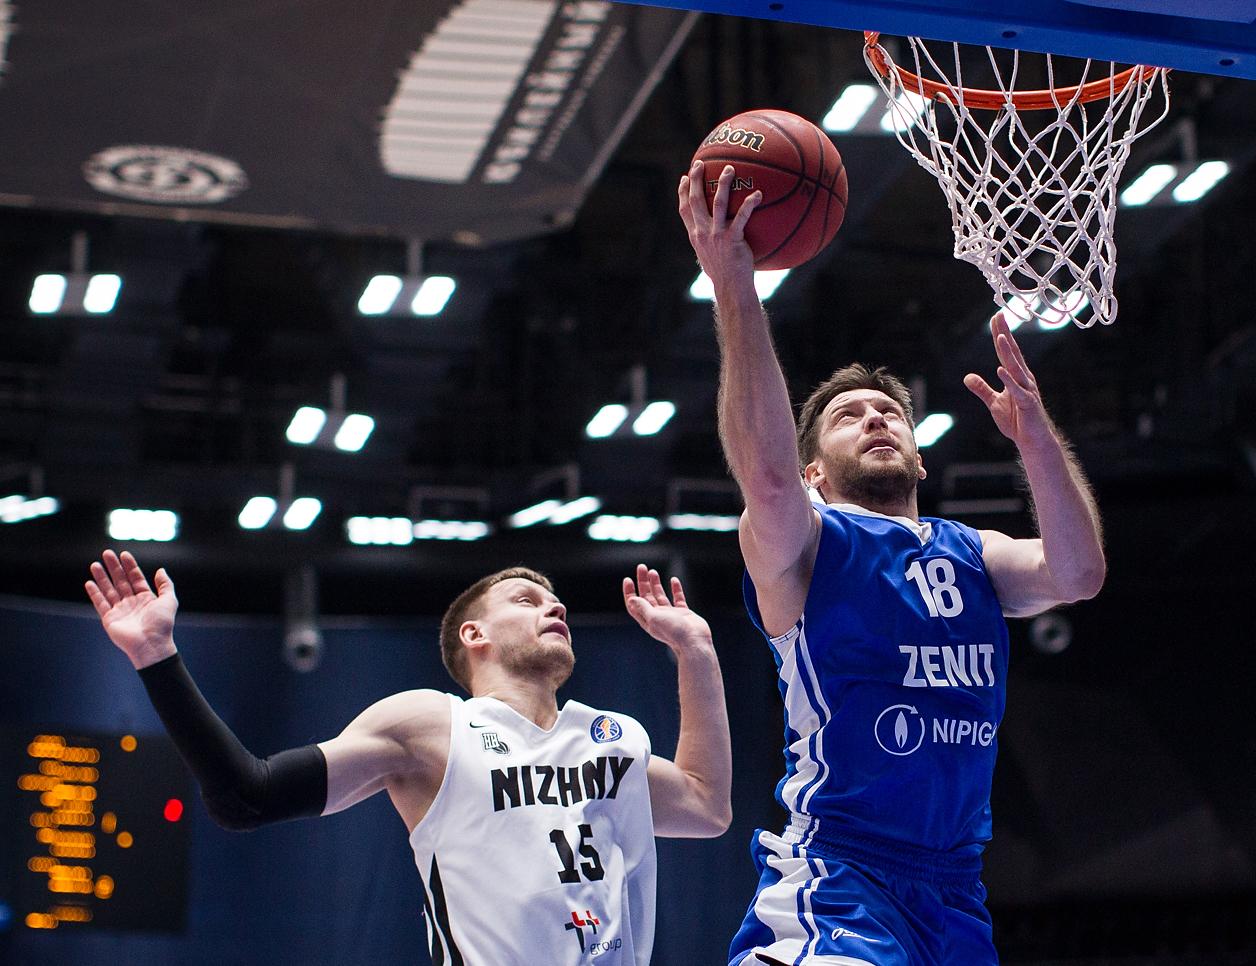 Zenit Earns Comeback Win vs. Nizhny Novgorod